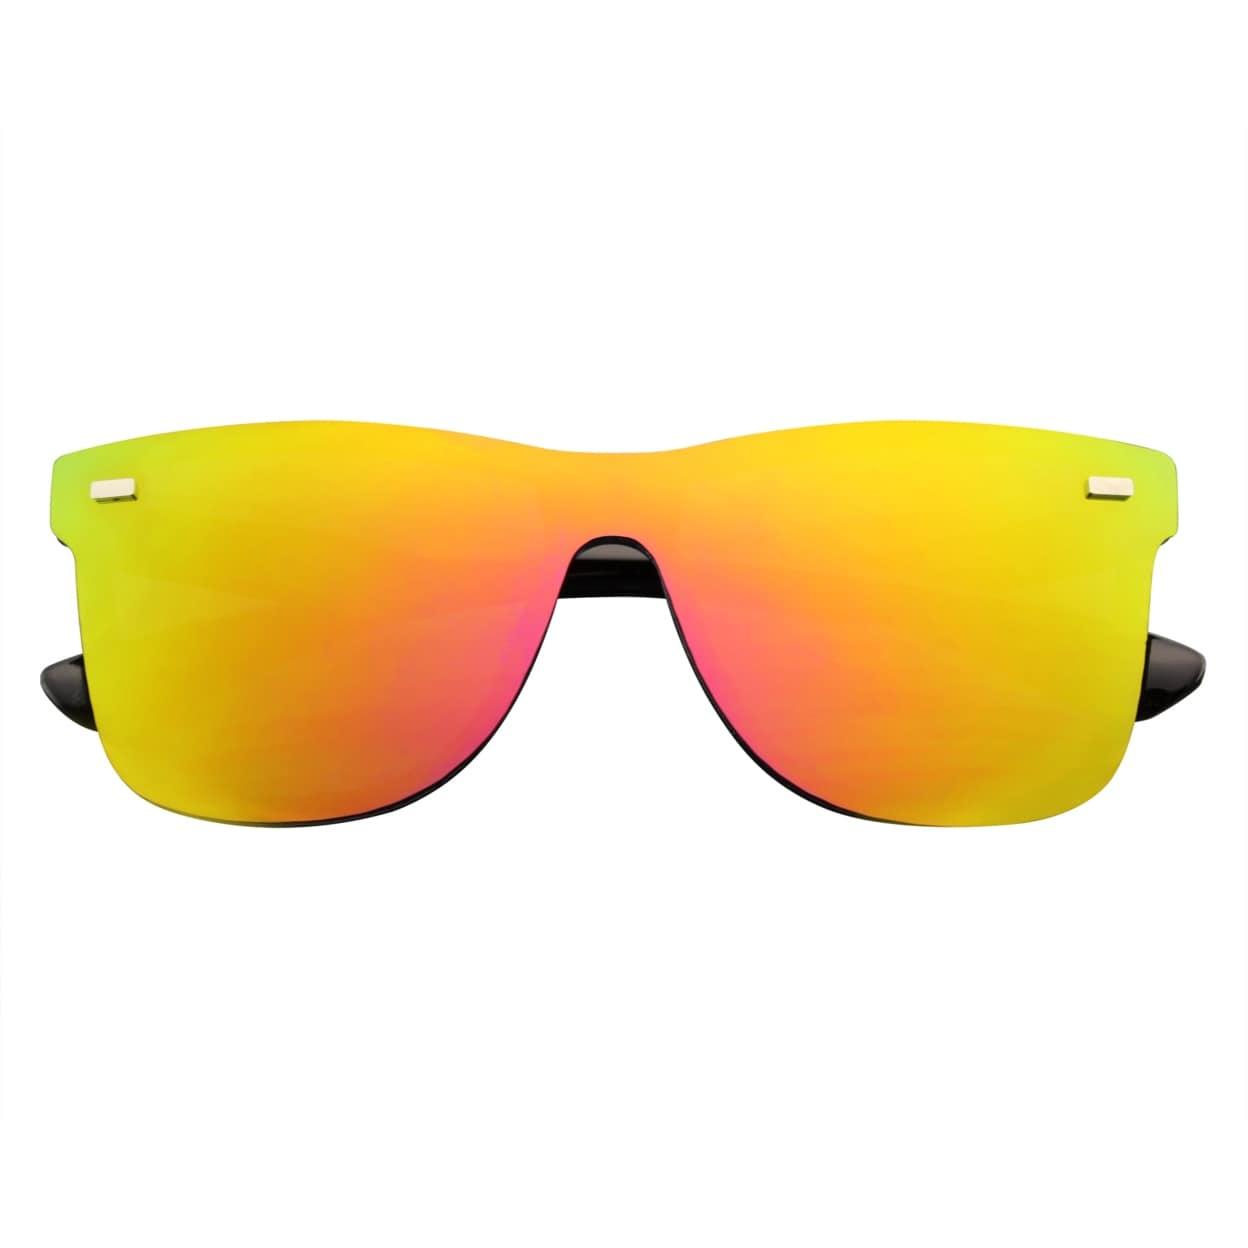 Mens Womens Mirrored Rimless Color Lens Reflective Retro Vintage Flat Sunglasses